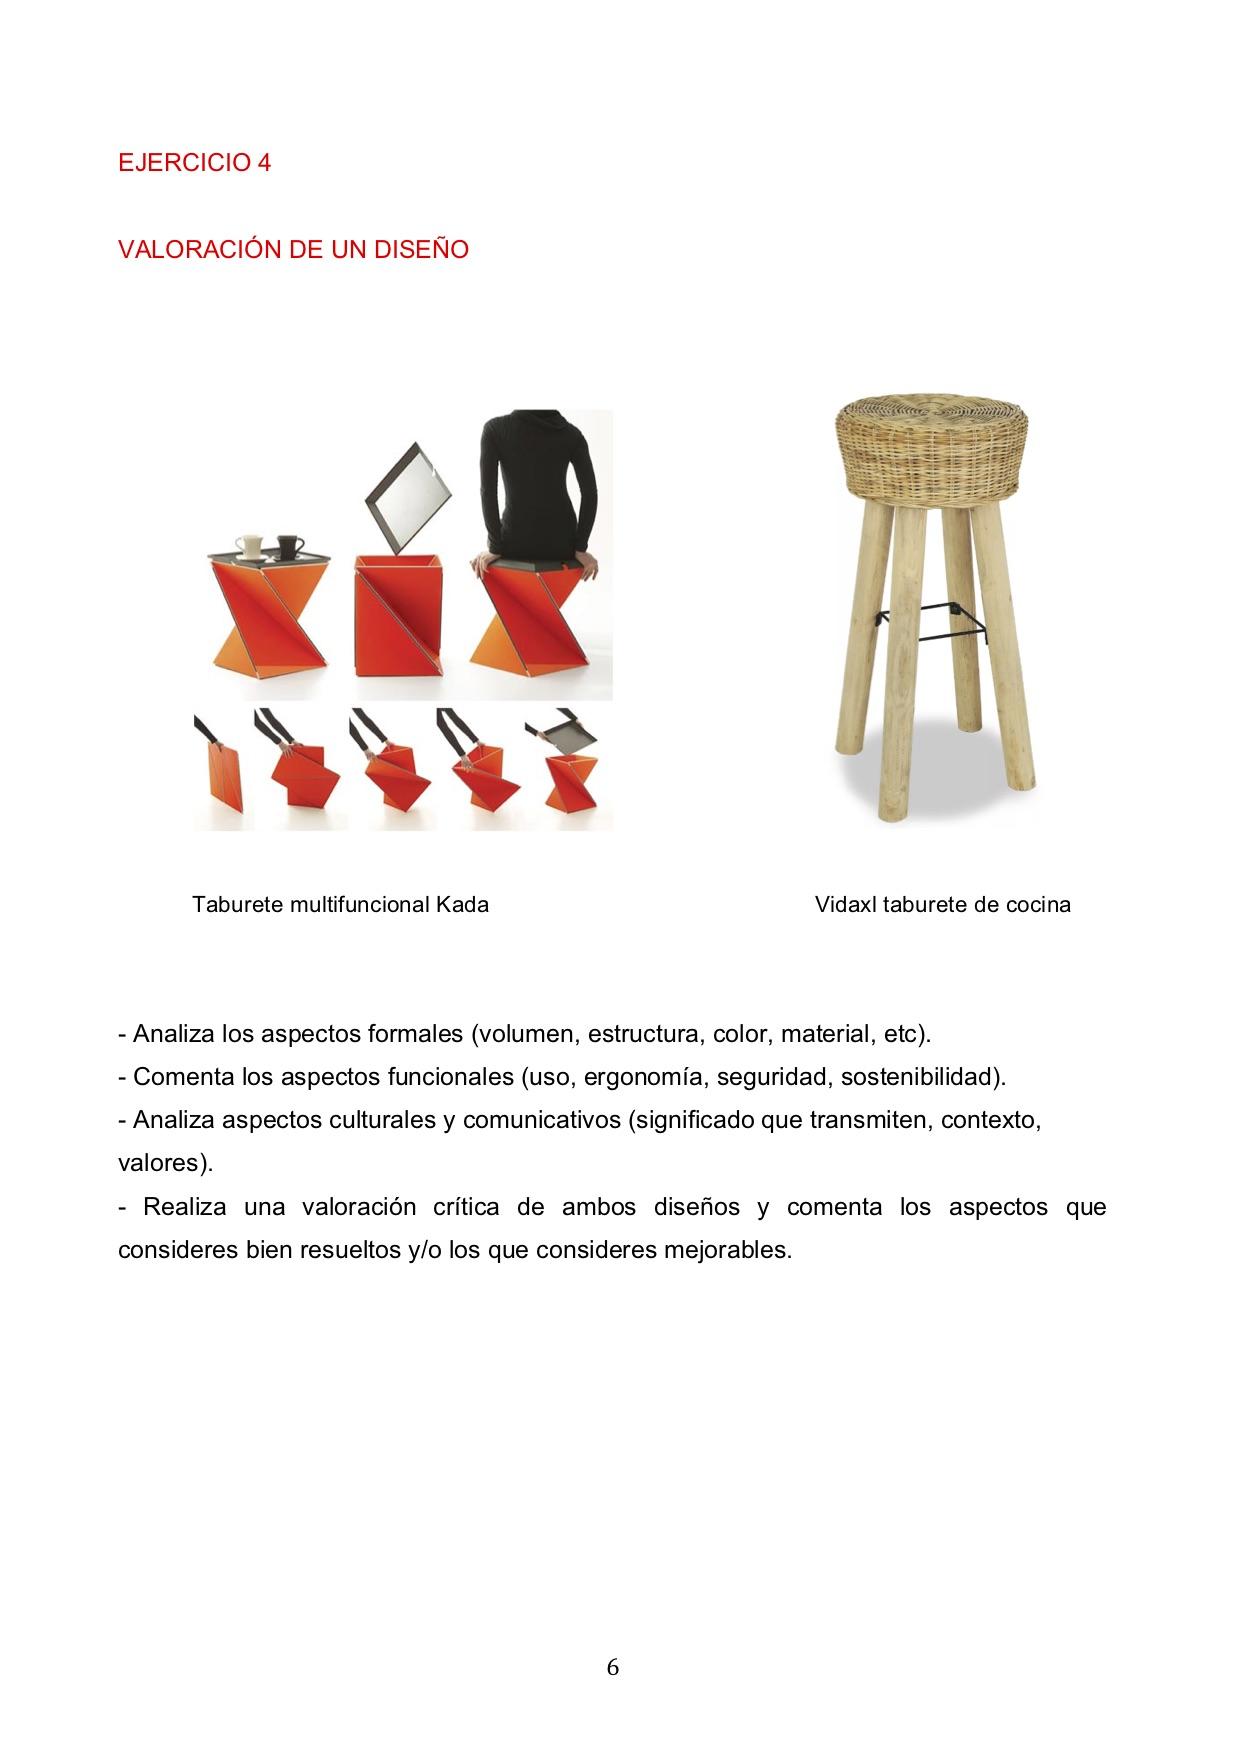 Modelo-prueba-Estudios-Superiores-de-diseño.-Llotja-2019-6